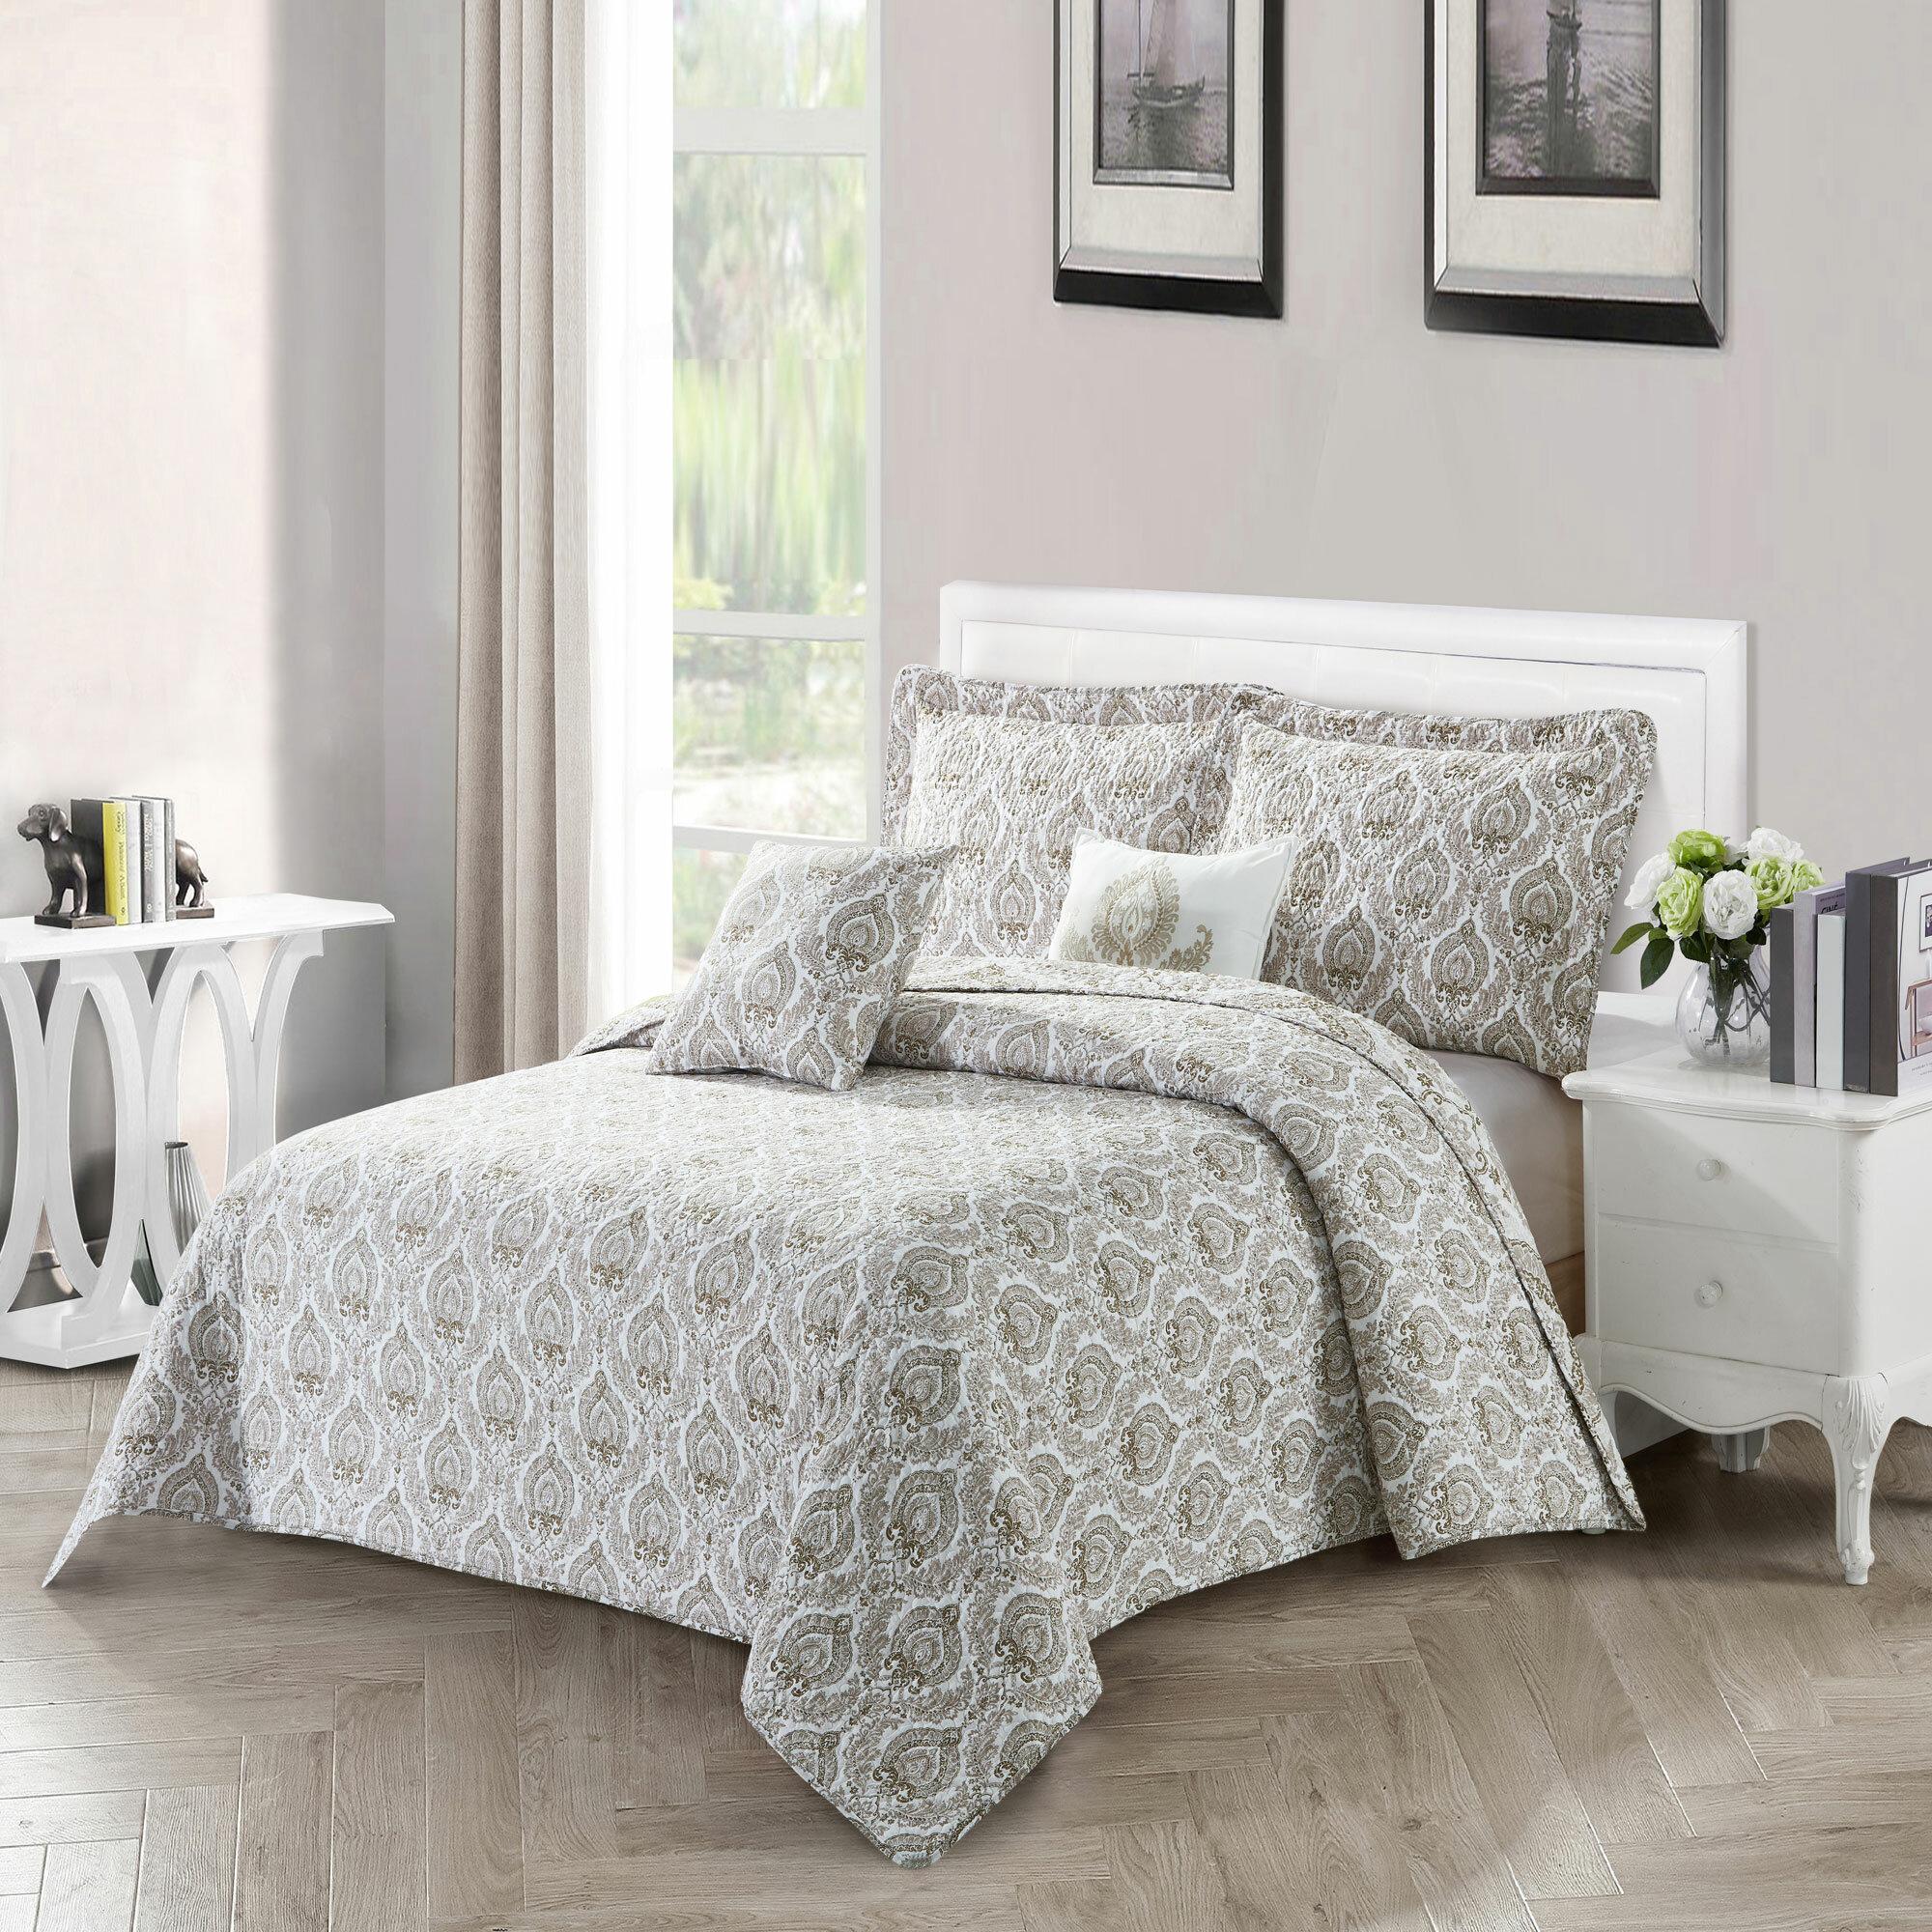 House Of Hampton Maleah Heart Damask Reversible Quilted Bedspread Set Reviews Wayfair